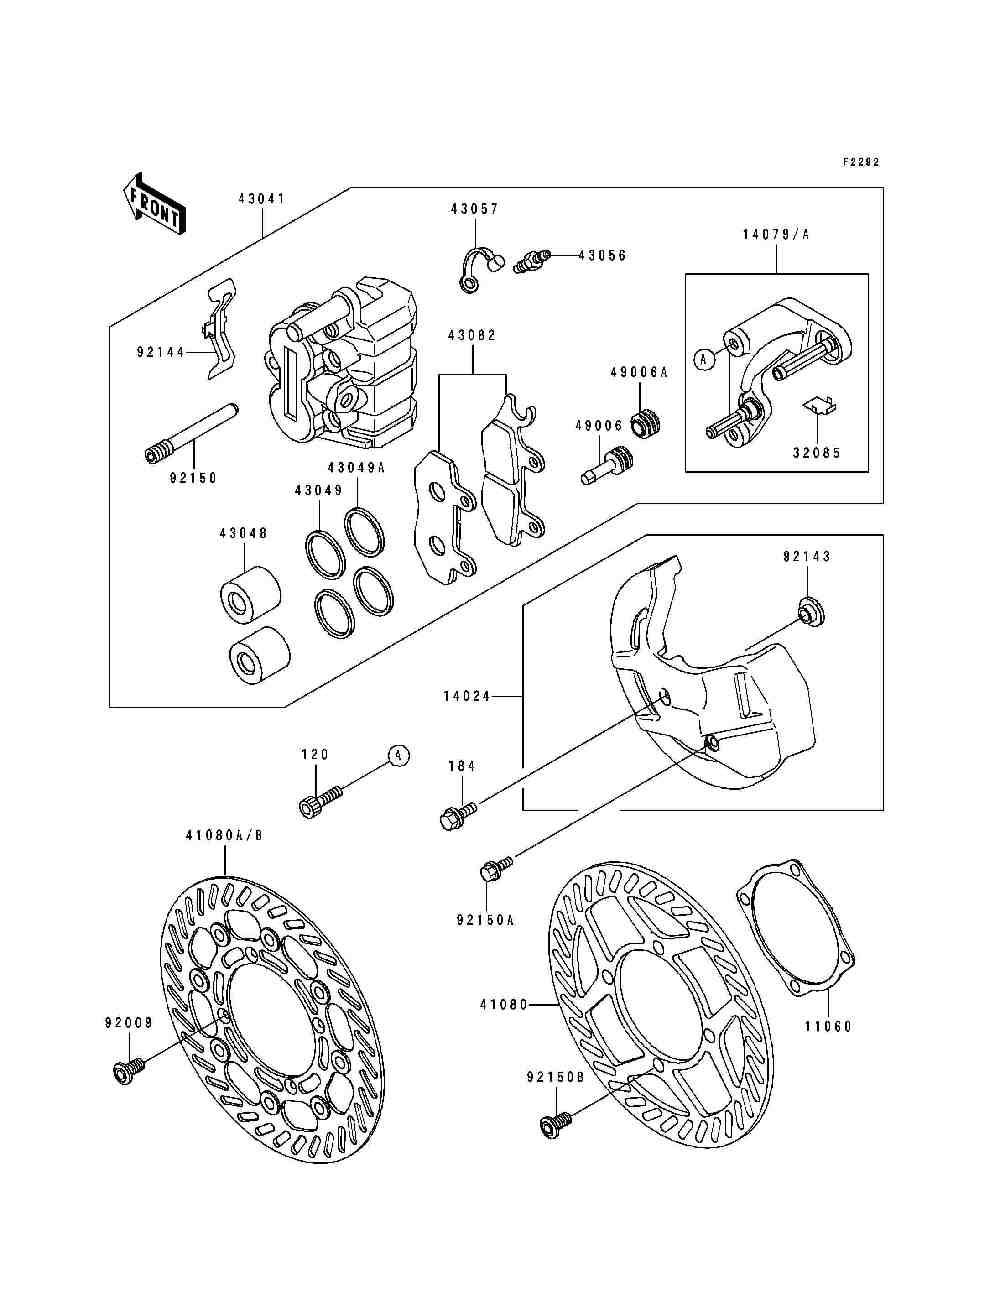 1991 kawasaki kdx 250 wiring diagram kawasaki wiring. Black Bedroom Furniture Sets. Home Design Ideas